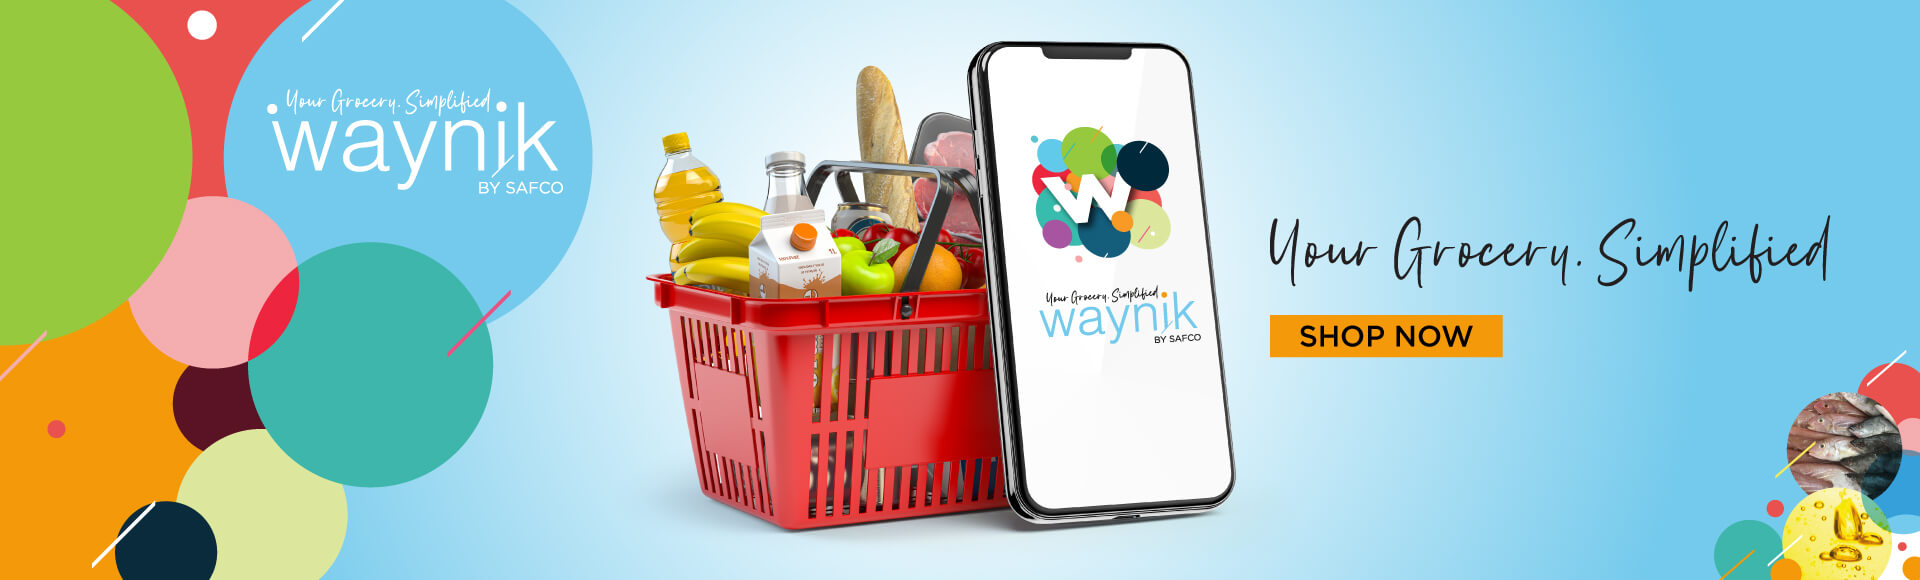 Waynik UAE, the best online supermarket in Dubai